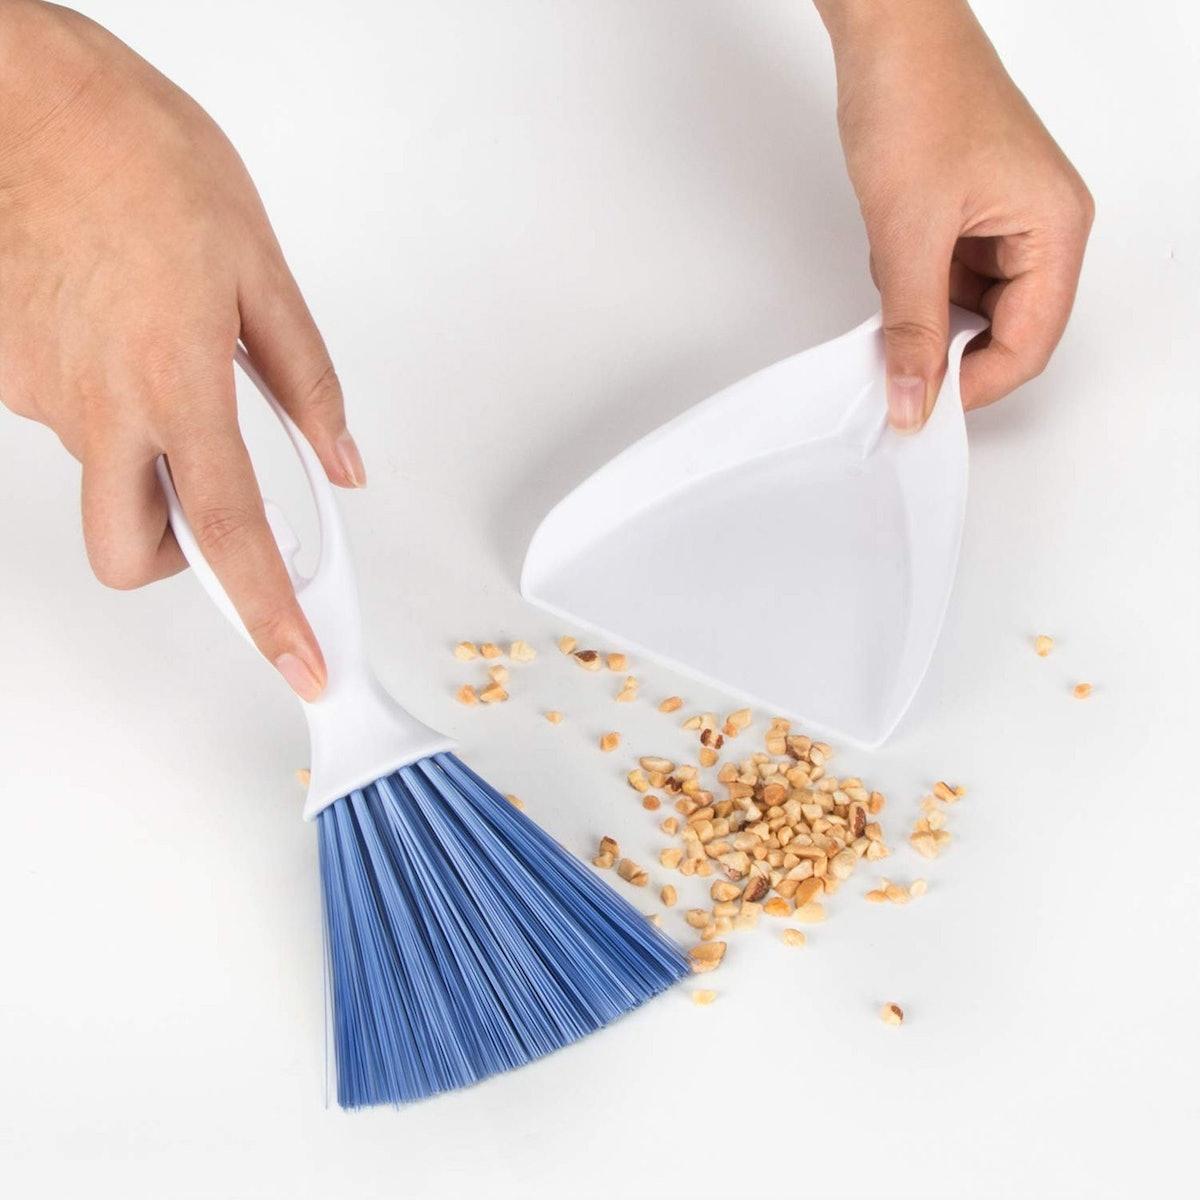 RIZON Hand Broom And Dustpan Set